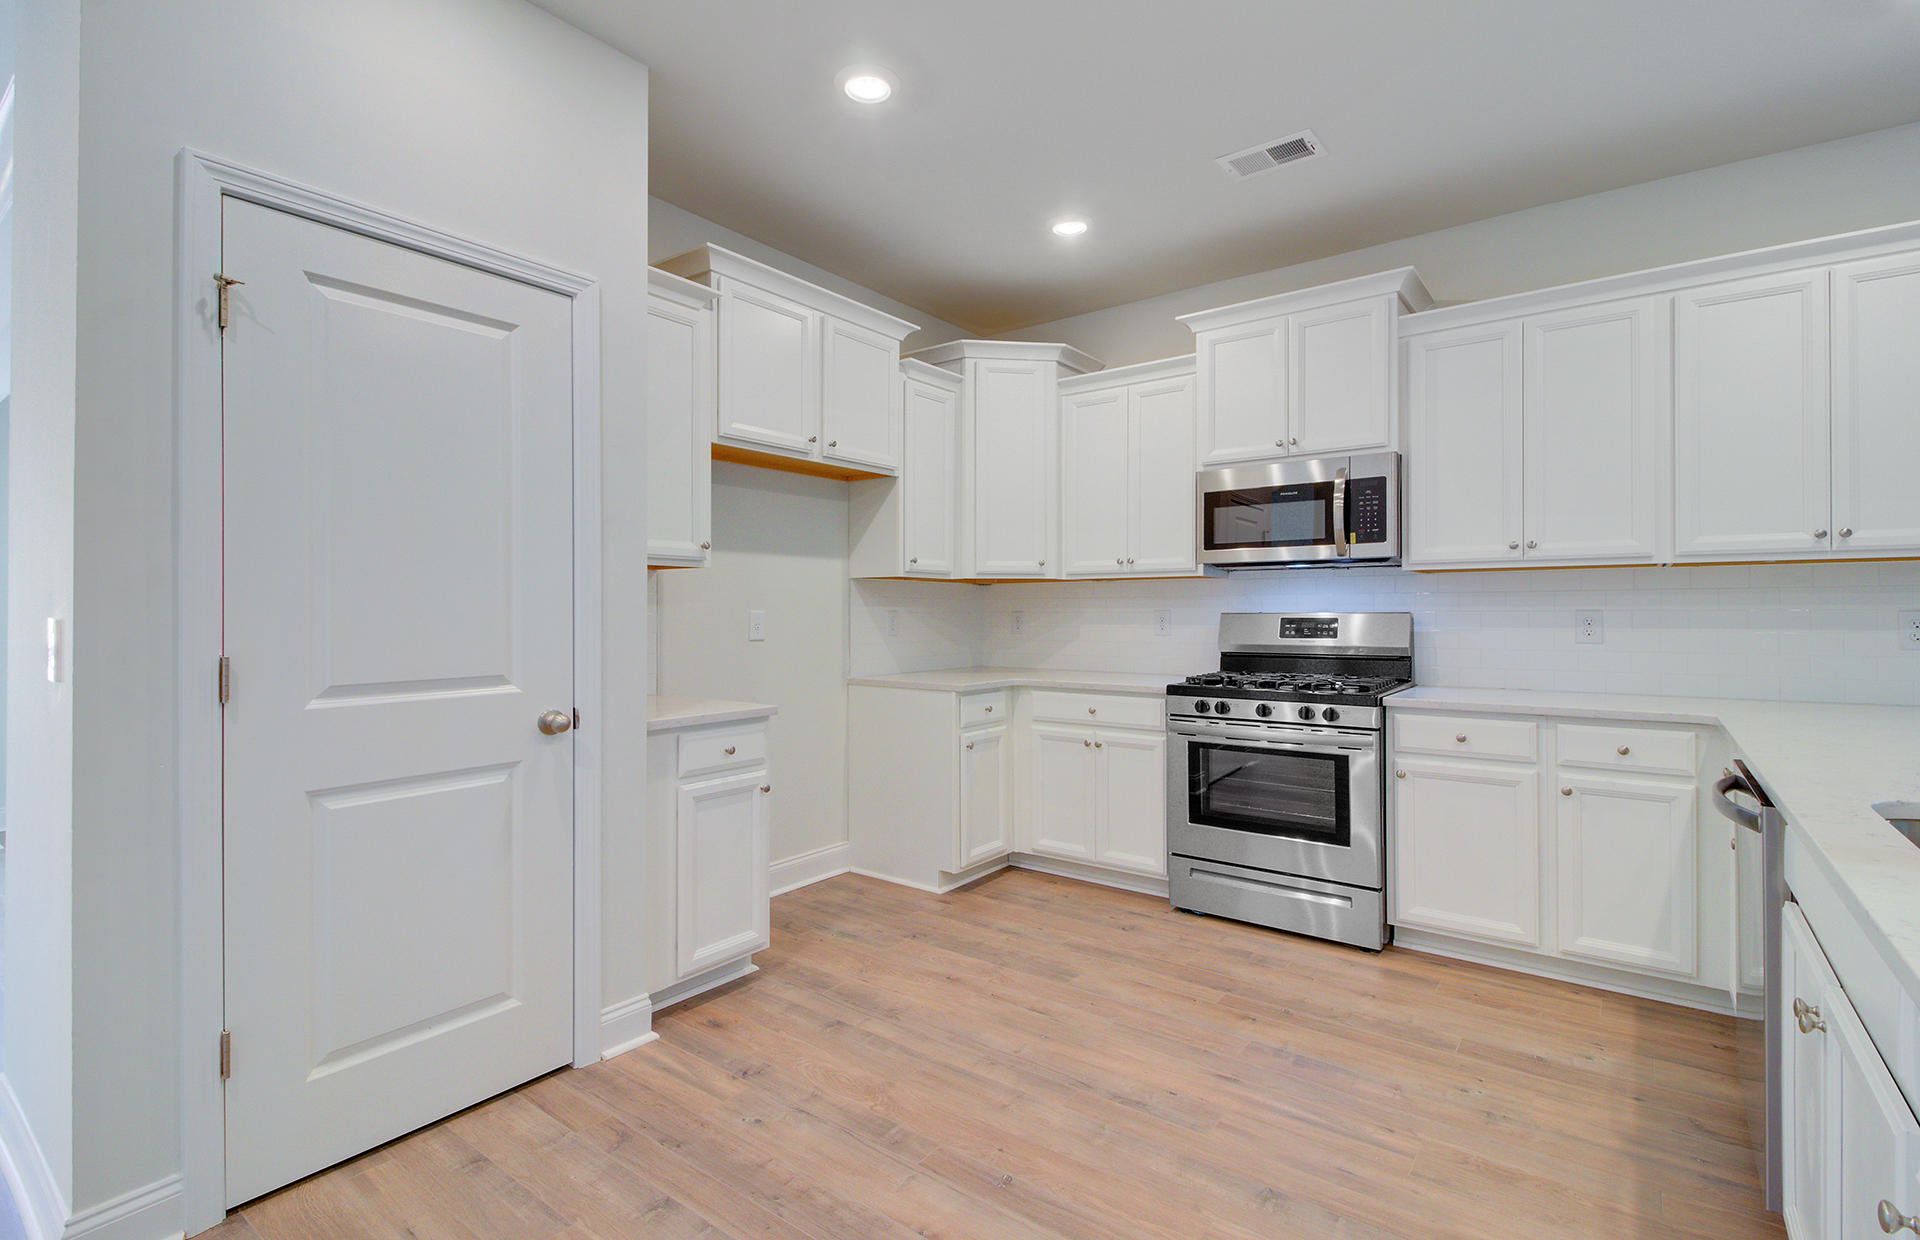 Park West Homes For Sale - 3030 Rice Field, Mount Pleasant, SC - 22